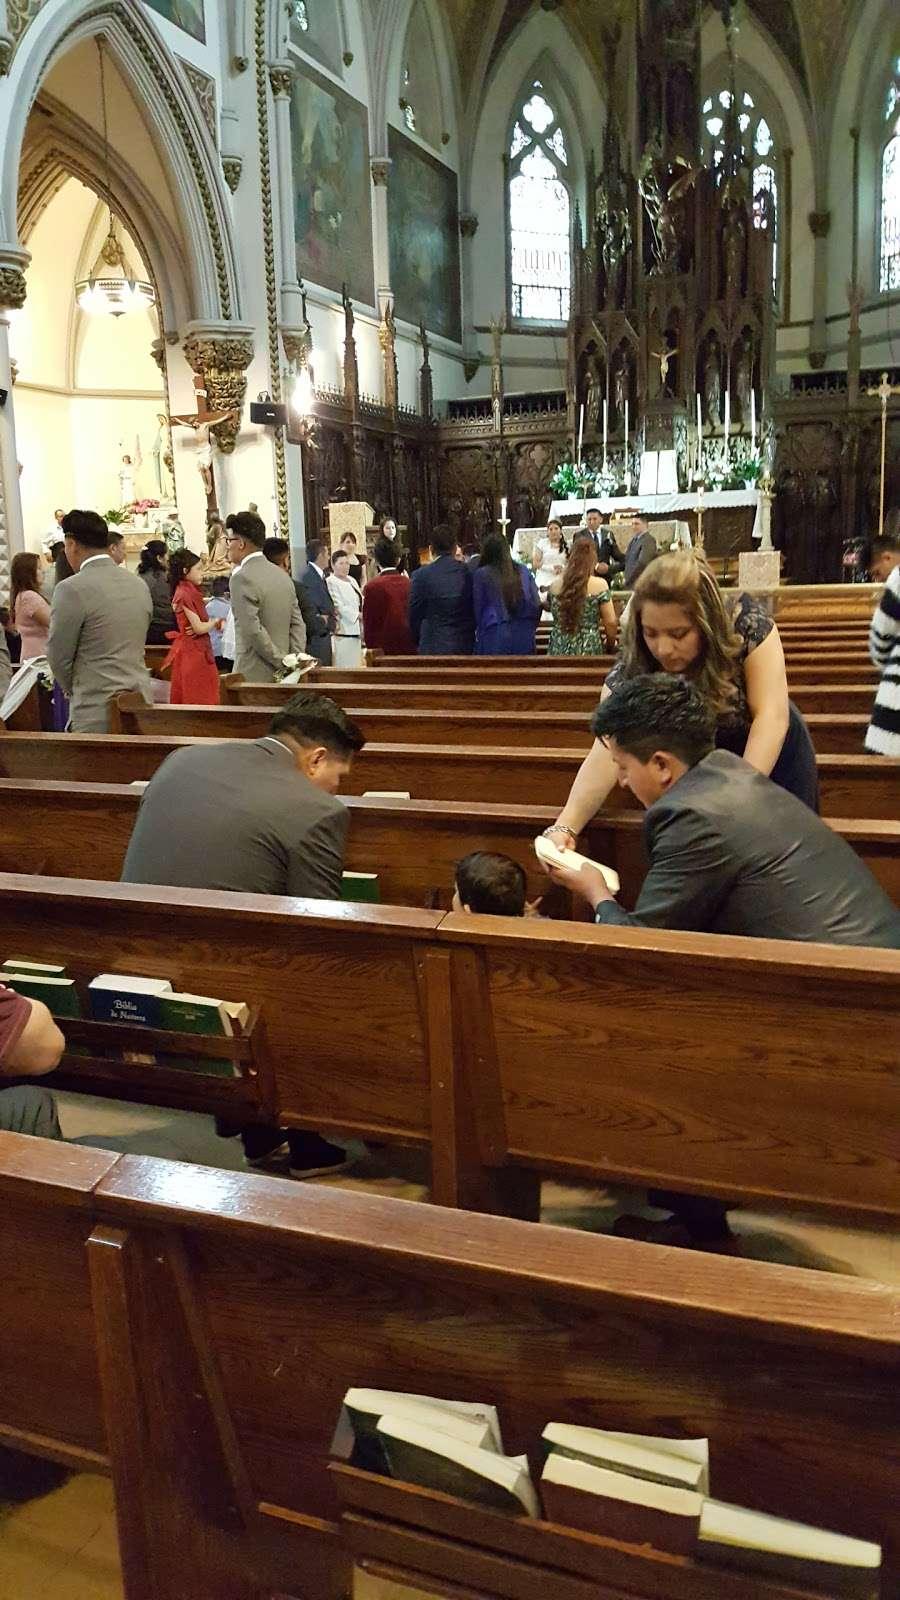 St Johns Roman Catholic Church - church  | Photo 7 of 10 | Address: 94 Ridge St, City of Orange, NJ 07050, USA | Phone: (973) 674-0110